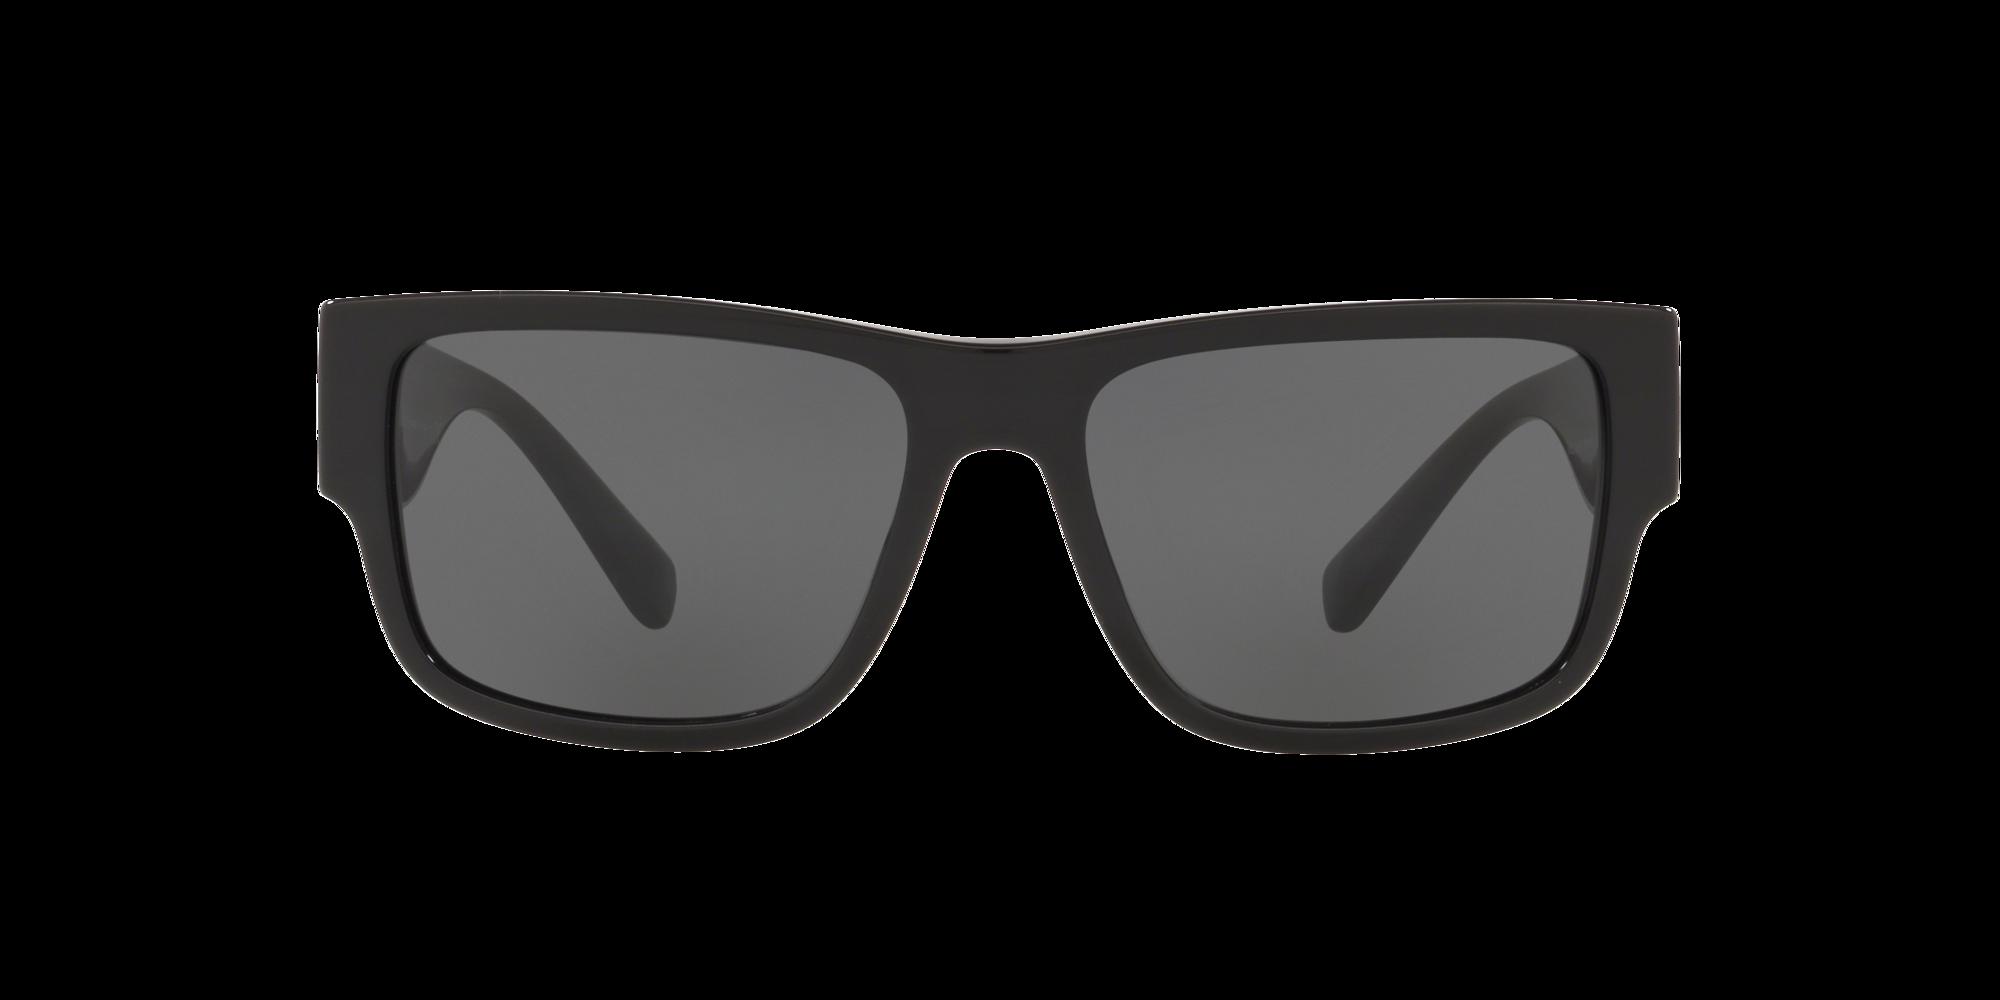 Image for VE4369 58 from LensCrafters | Glasses, Prescription Glasses Online, Eyewear